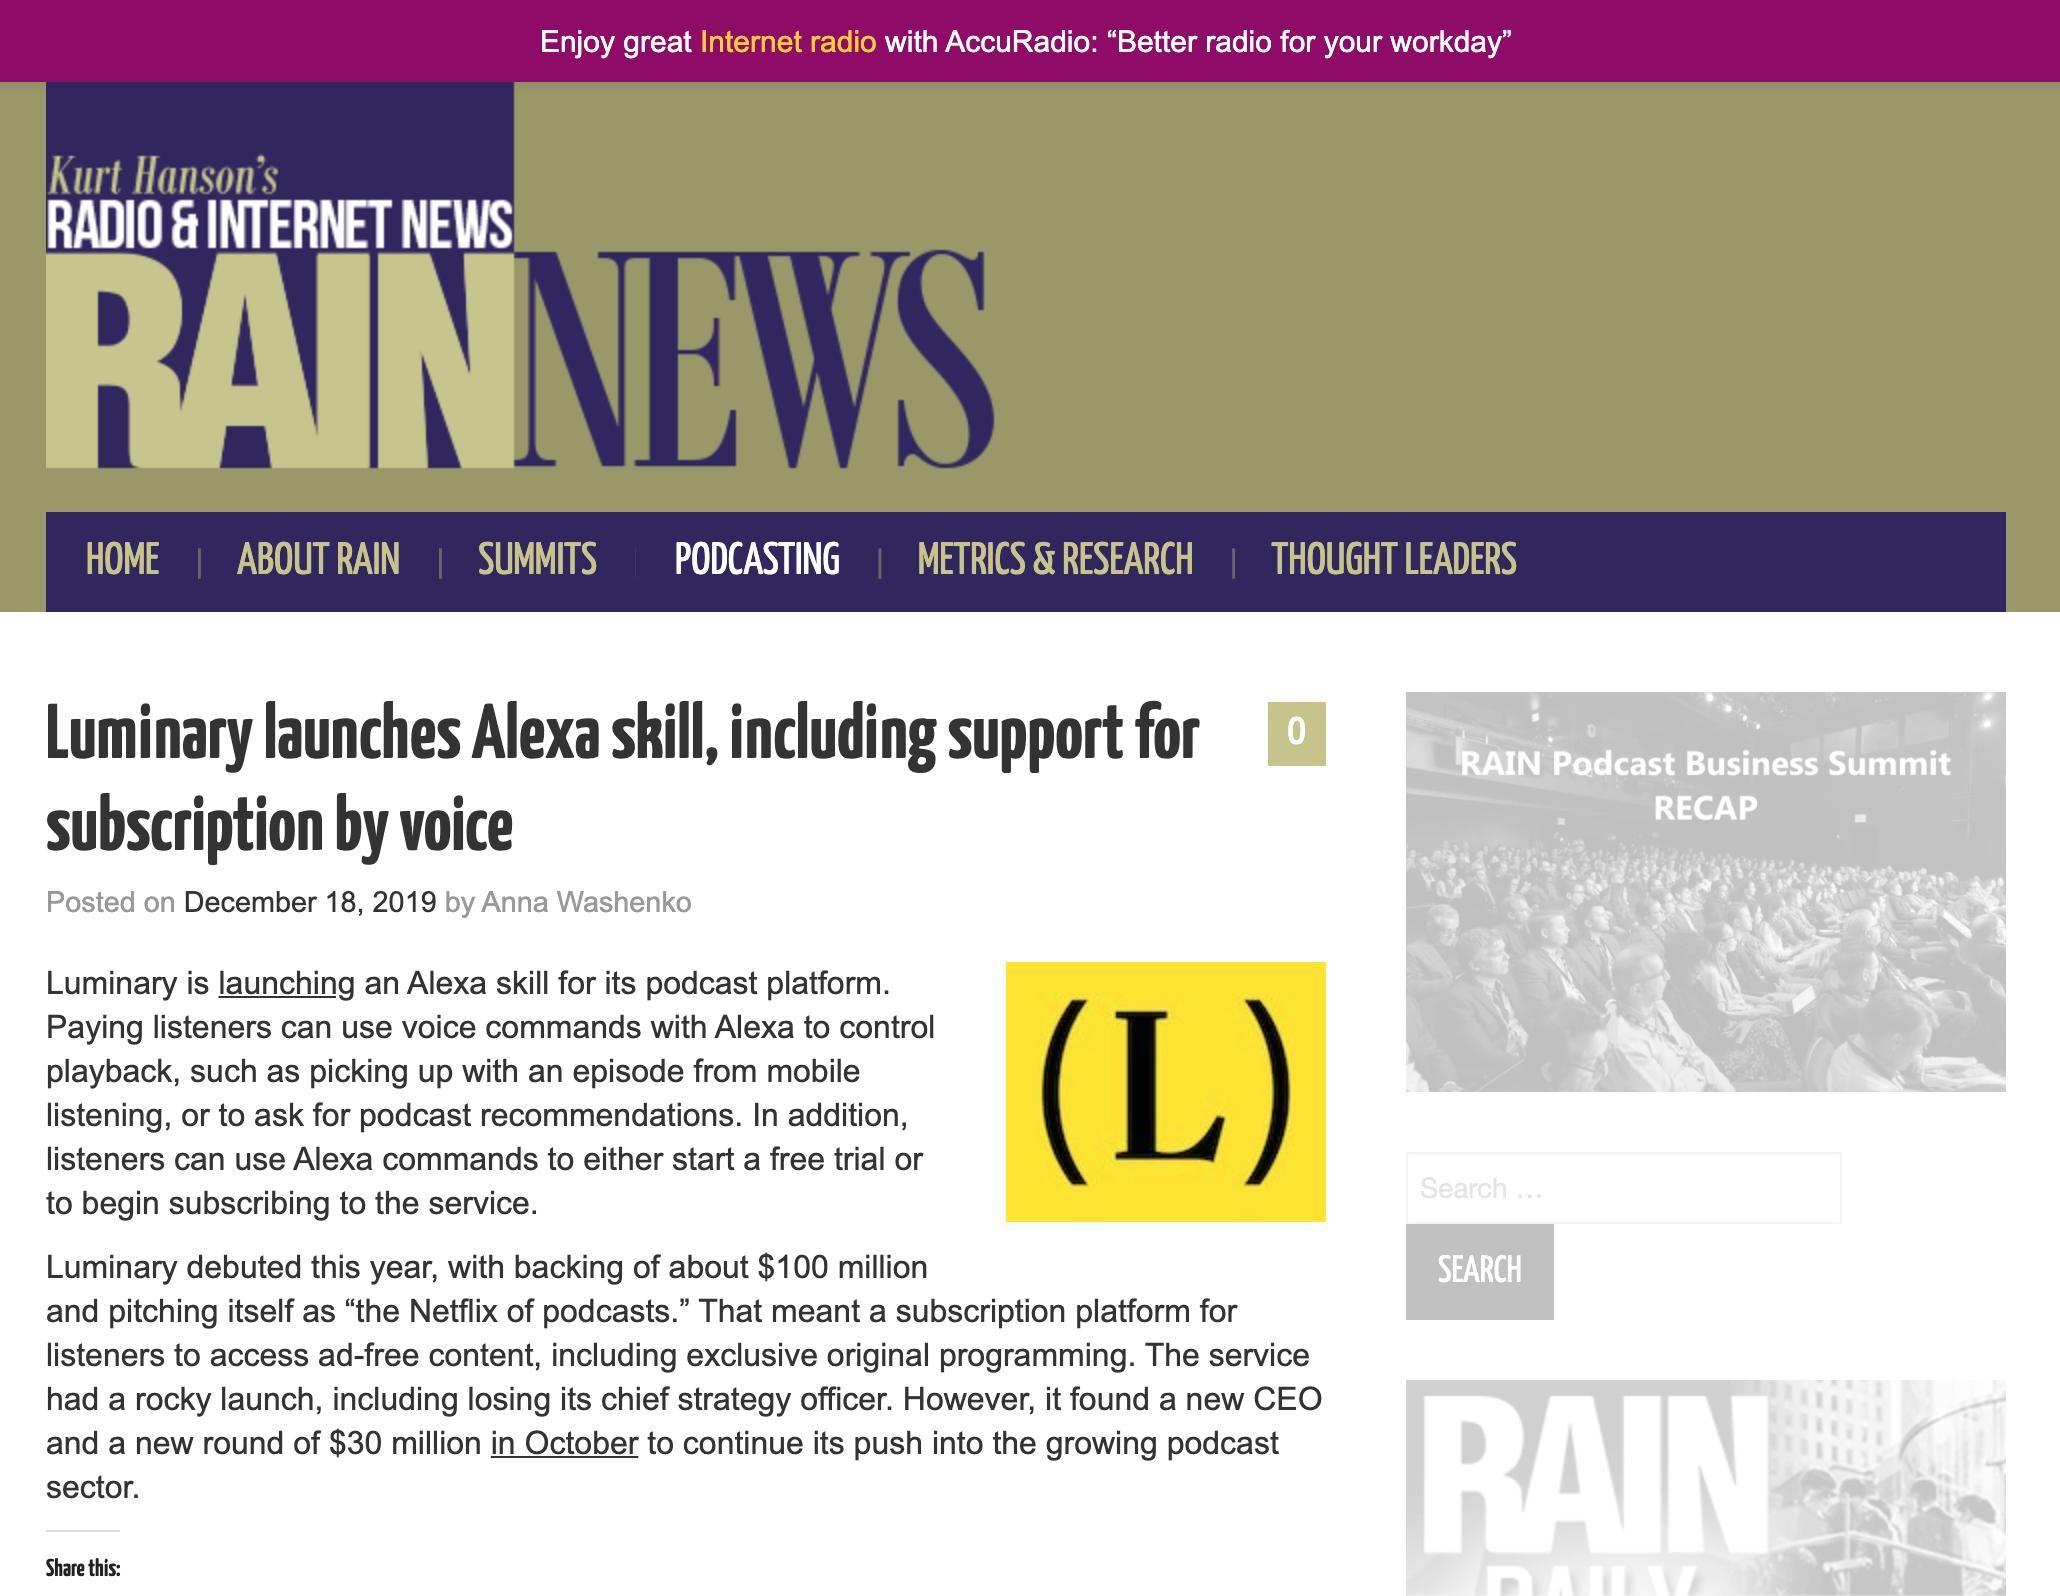 rainnews